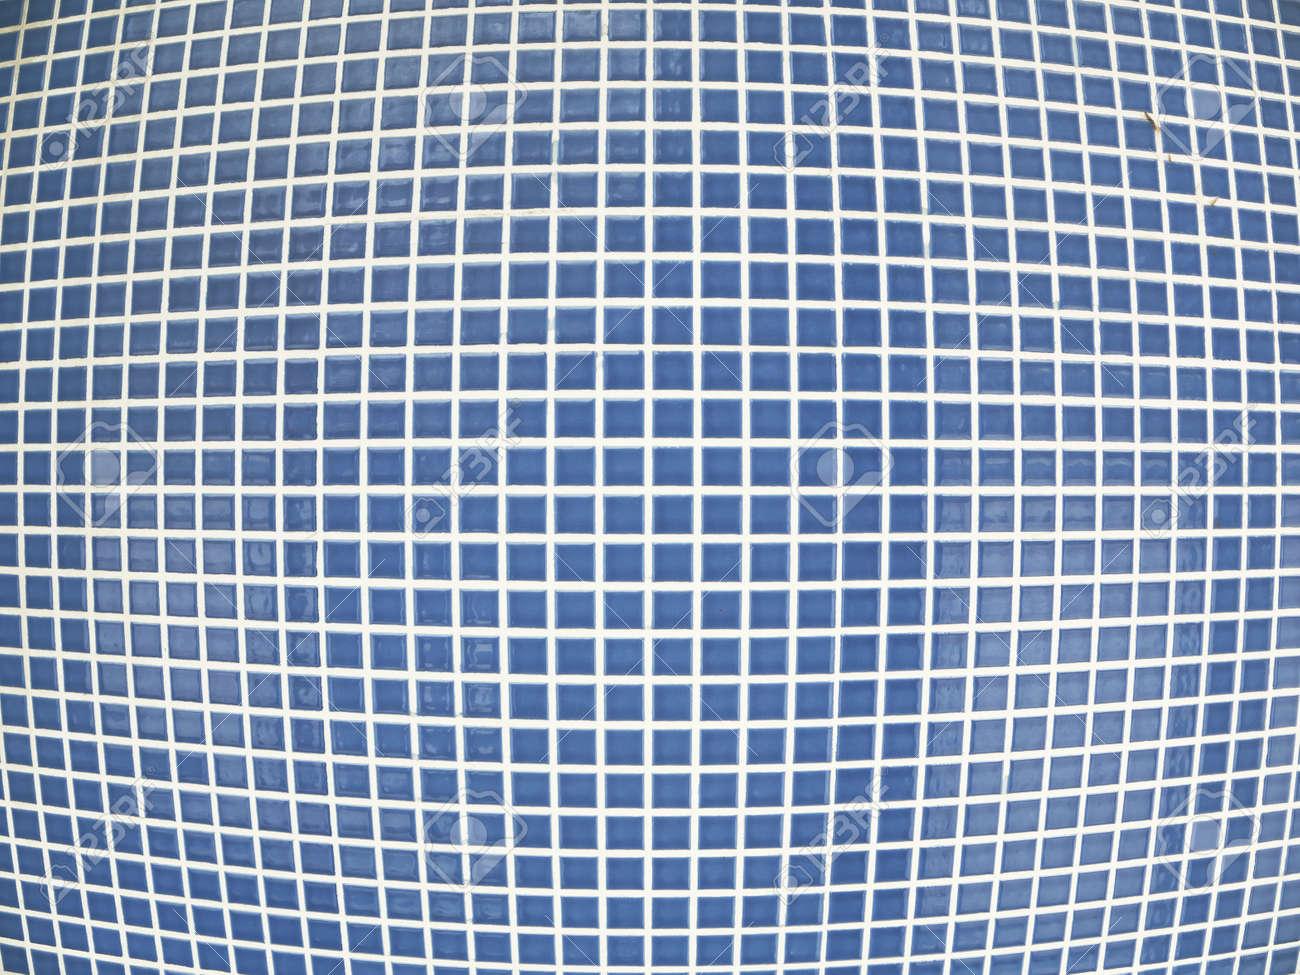 bottomed pool mosaic creating abstract photography Stock Photo - 16514951